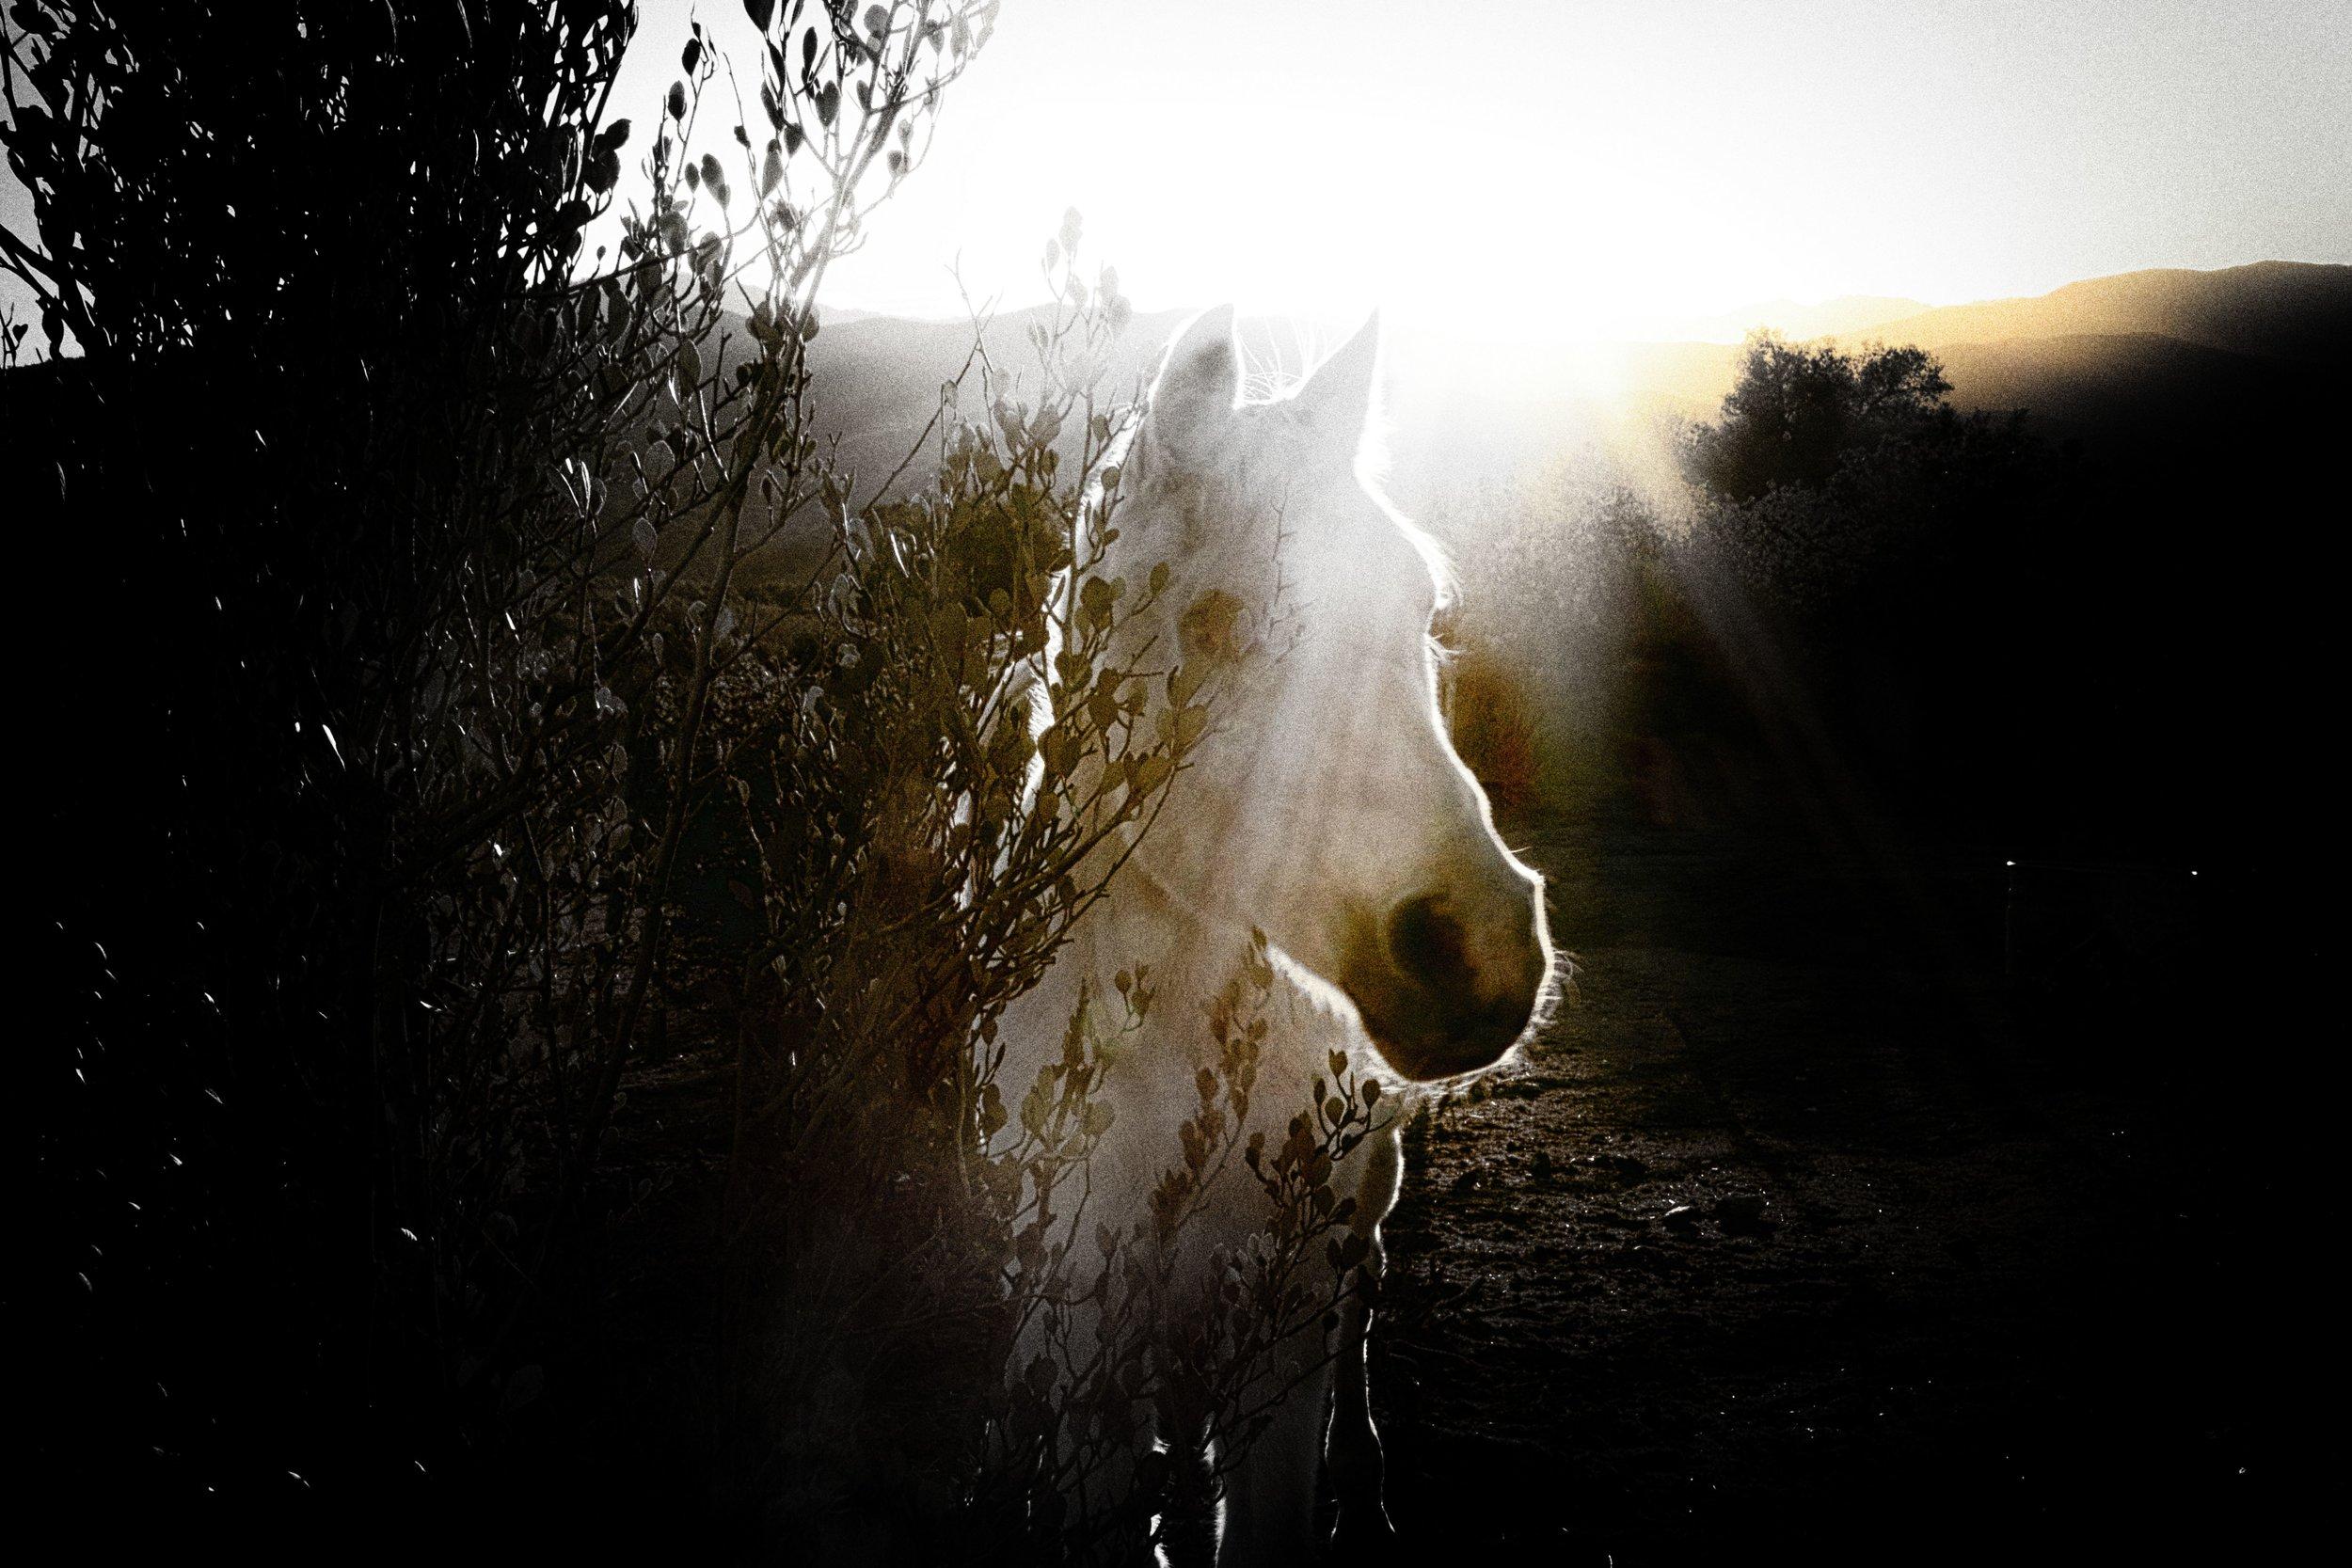 Silver, namesake and director of Silver Horse Retreat